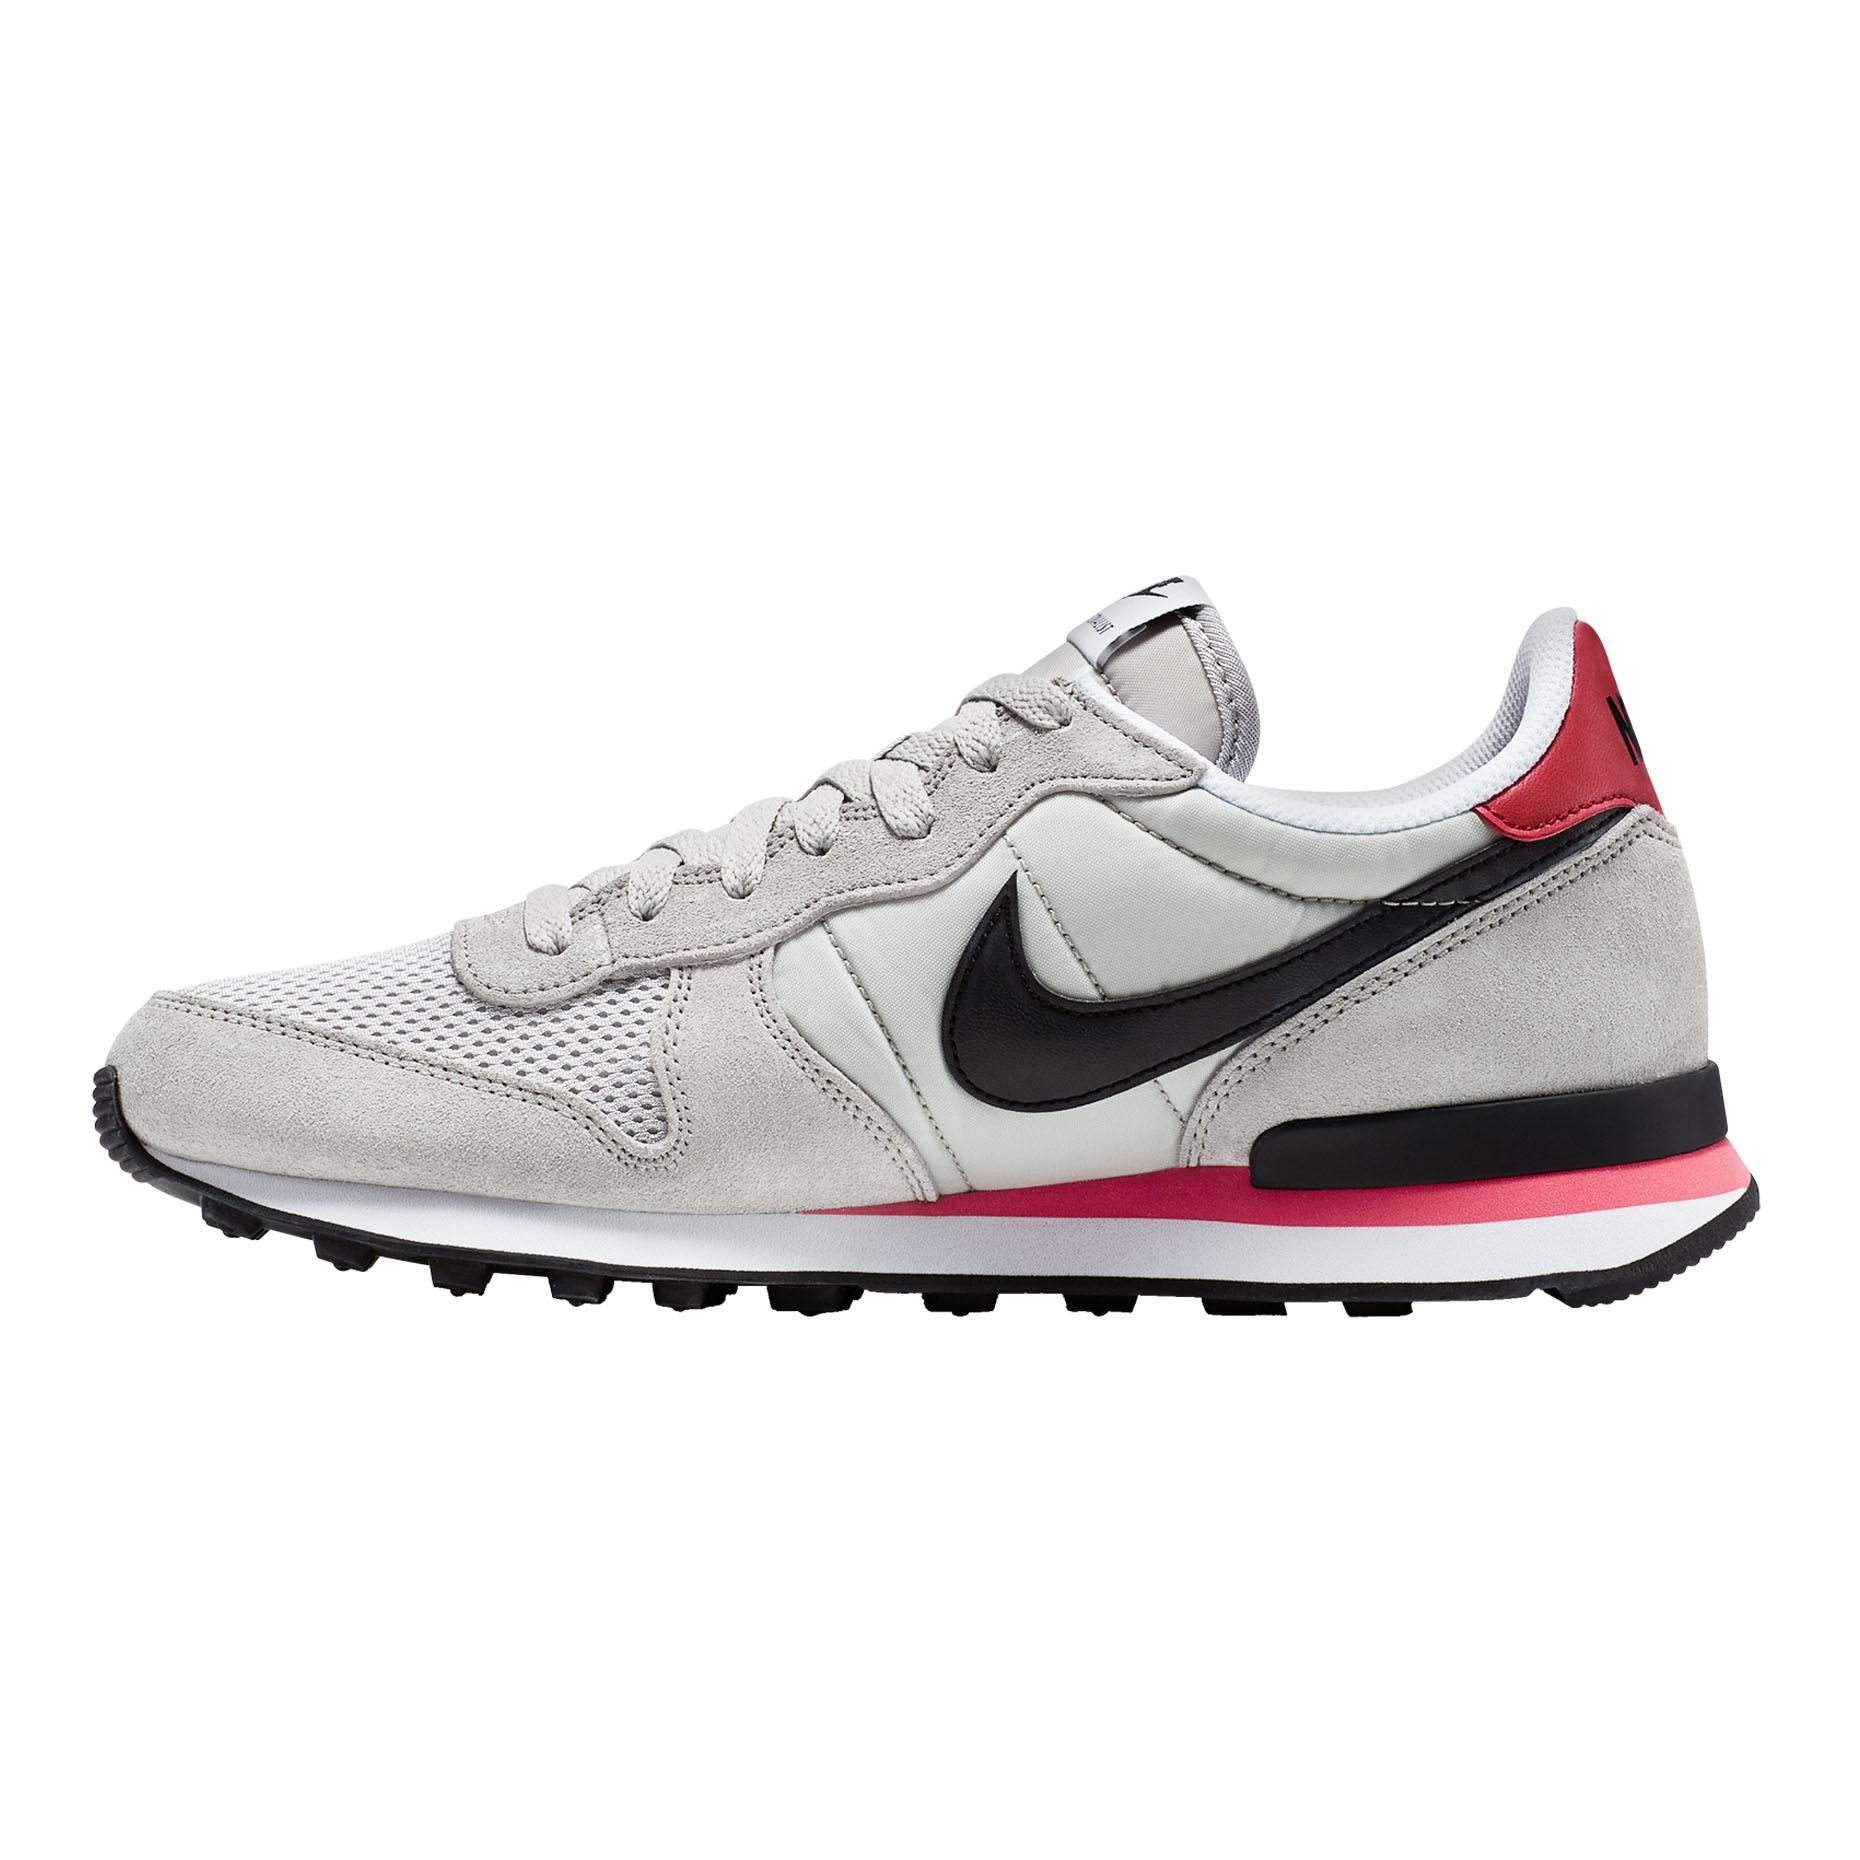 кроссовки Nike 2015 631754-200-201-006 кроссовки nike tokicc 599441 019